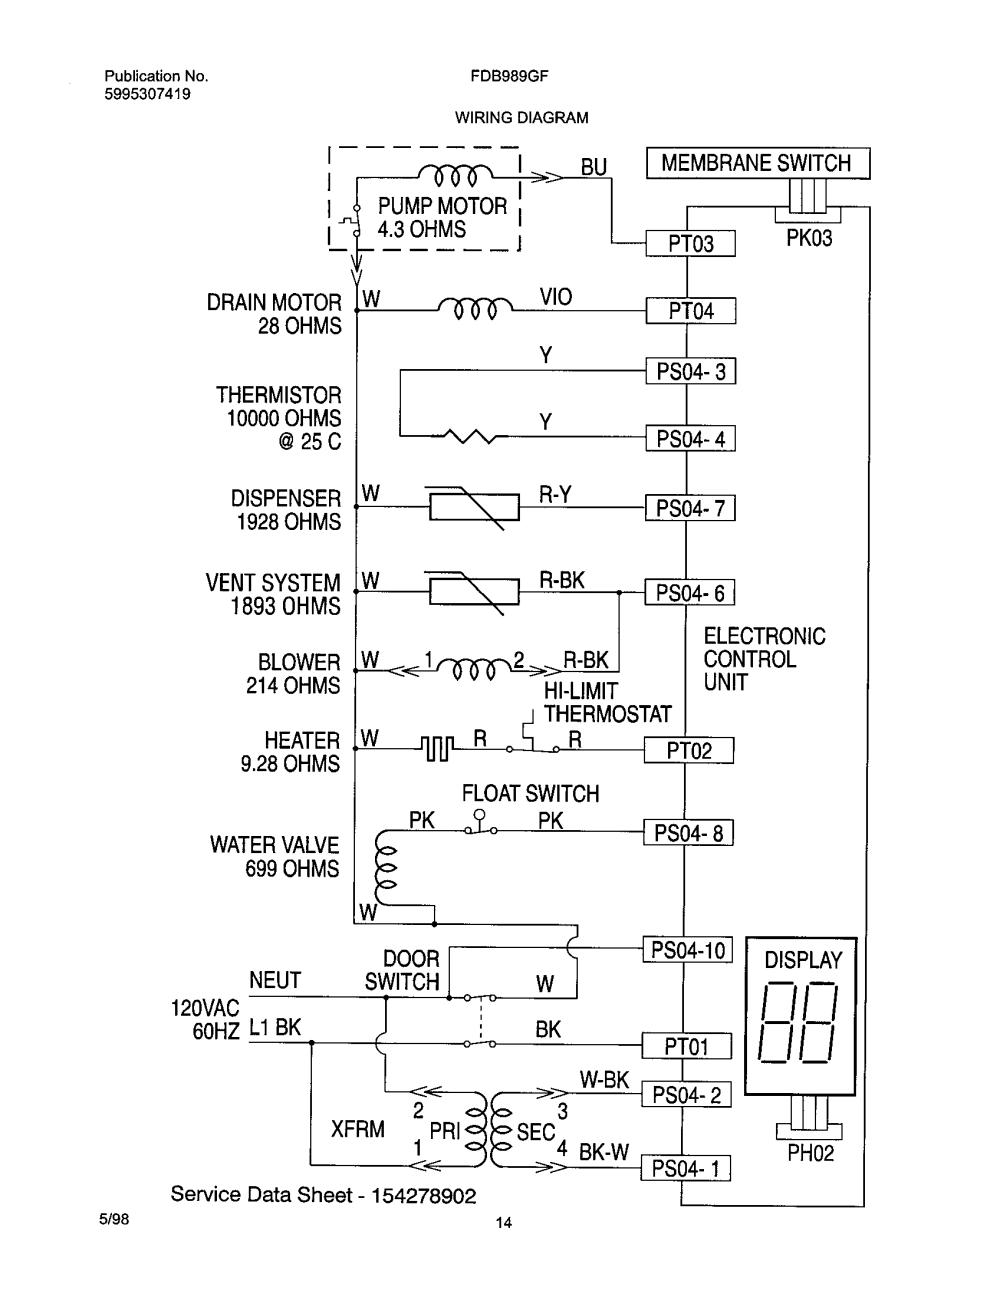 medium resolution of frigidaire dishwasher wiring diagrams wiring diagram hostfrigidaire dishwasher wiring diagrams